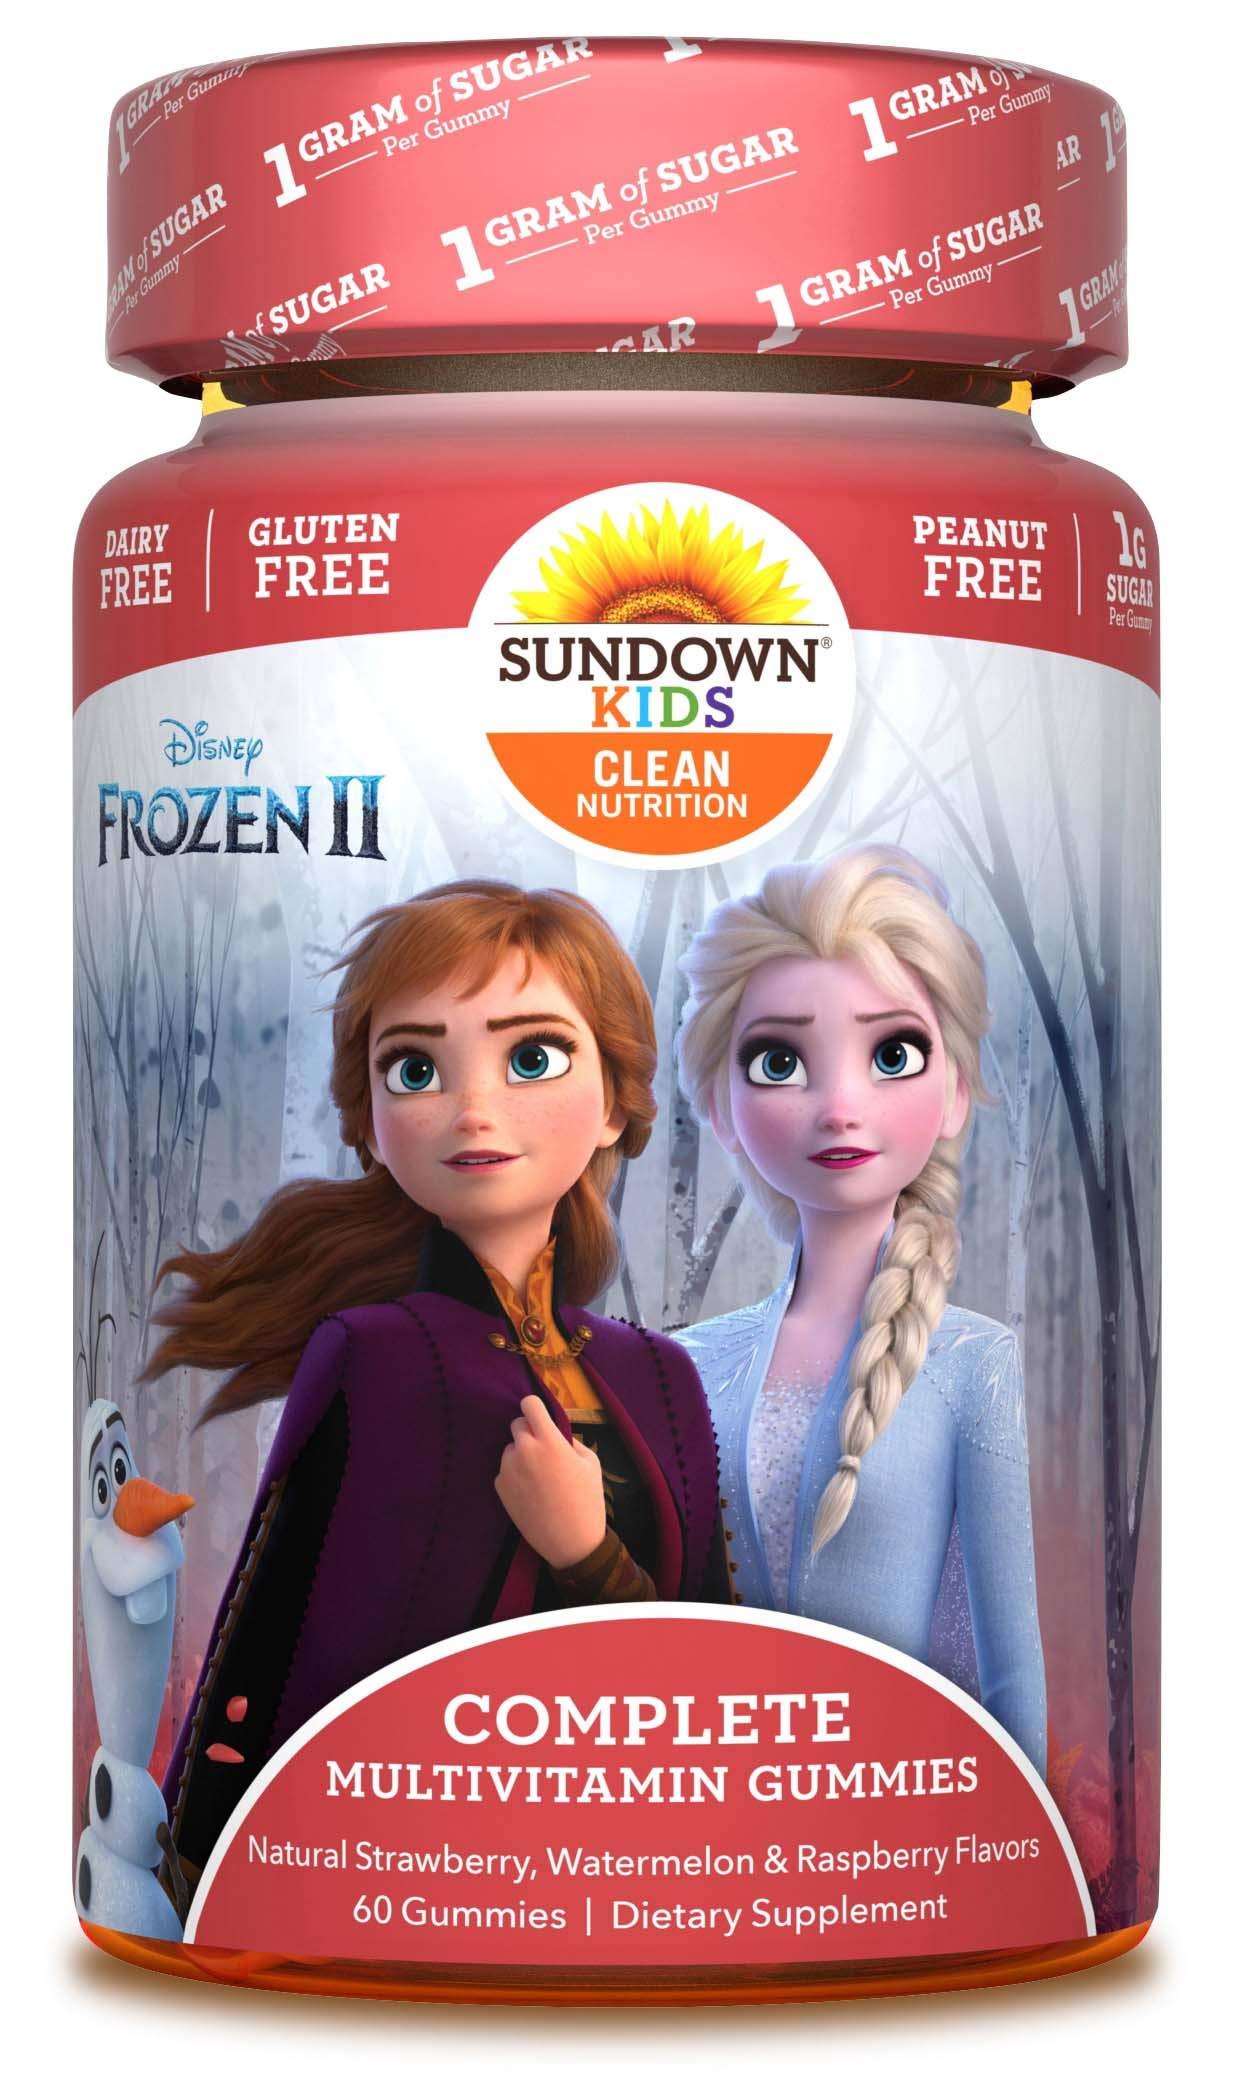 Sundown Kids Disney Frozen 2 Multivitamin Gummies, Vitamins A, C, D, E, Gluten-Free, Dairy-Free, Peanut-Free, 60 Count